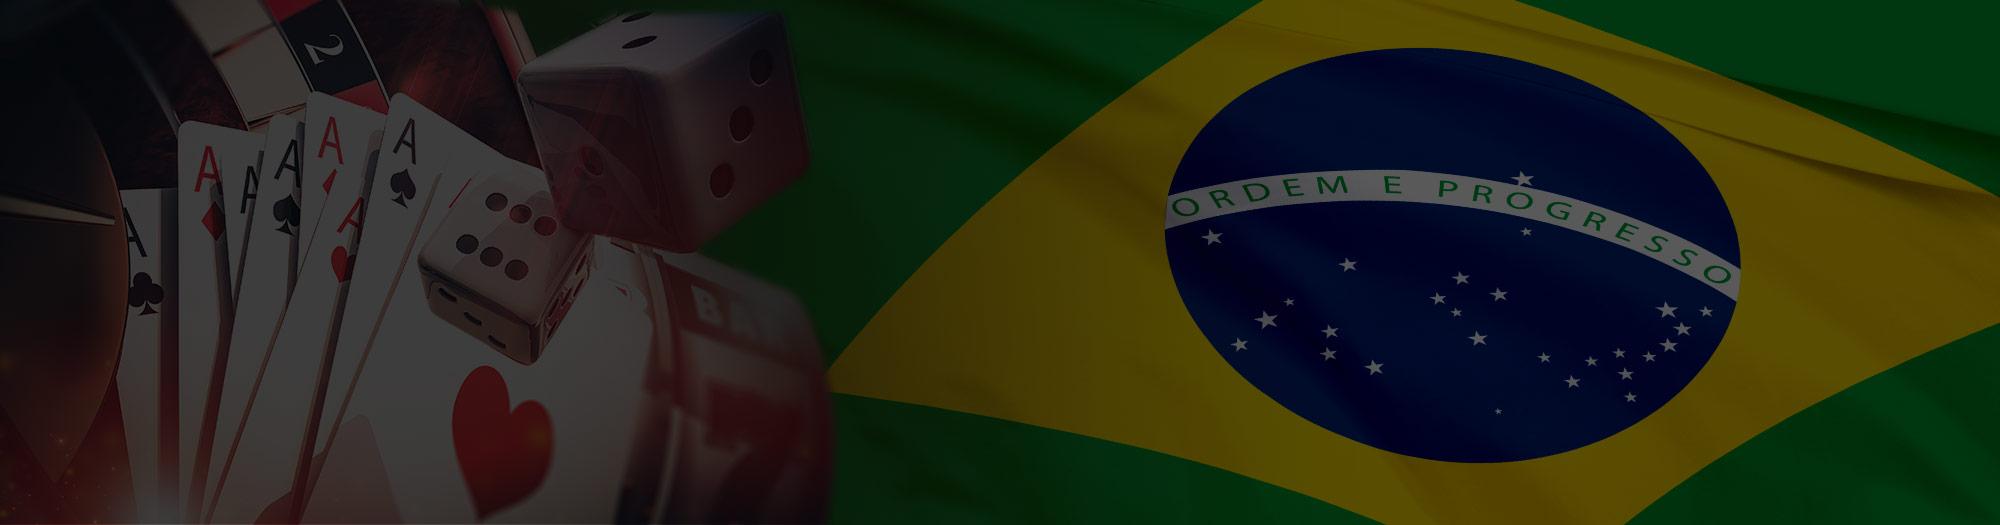 Bingo club Brasil 37698